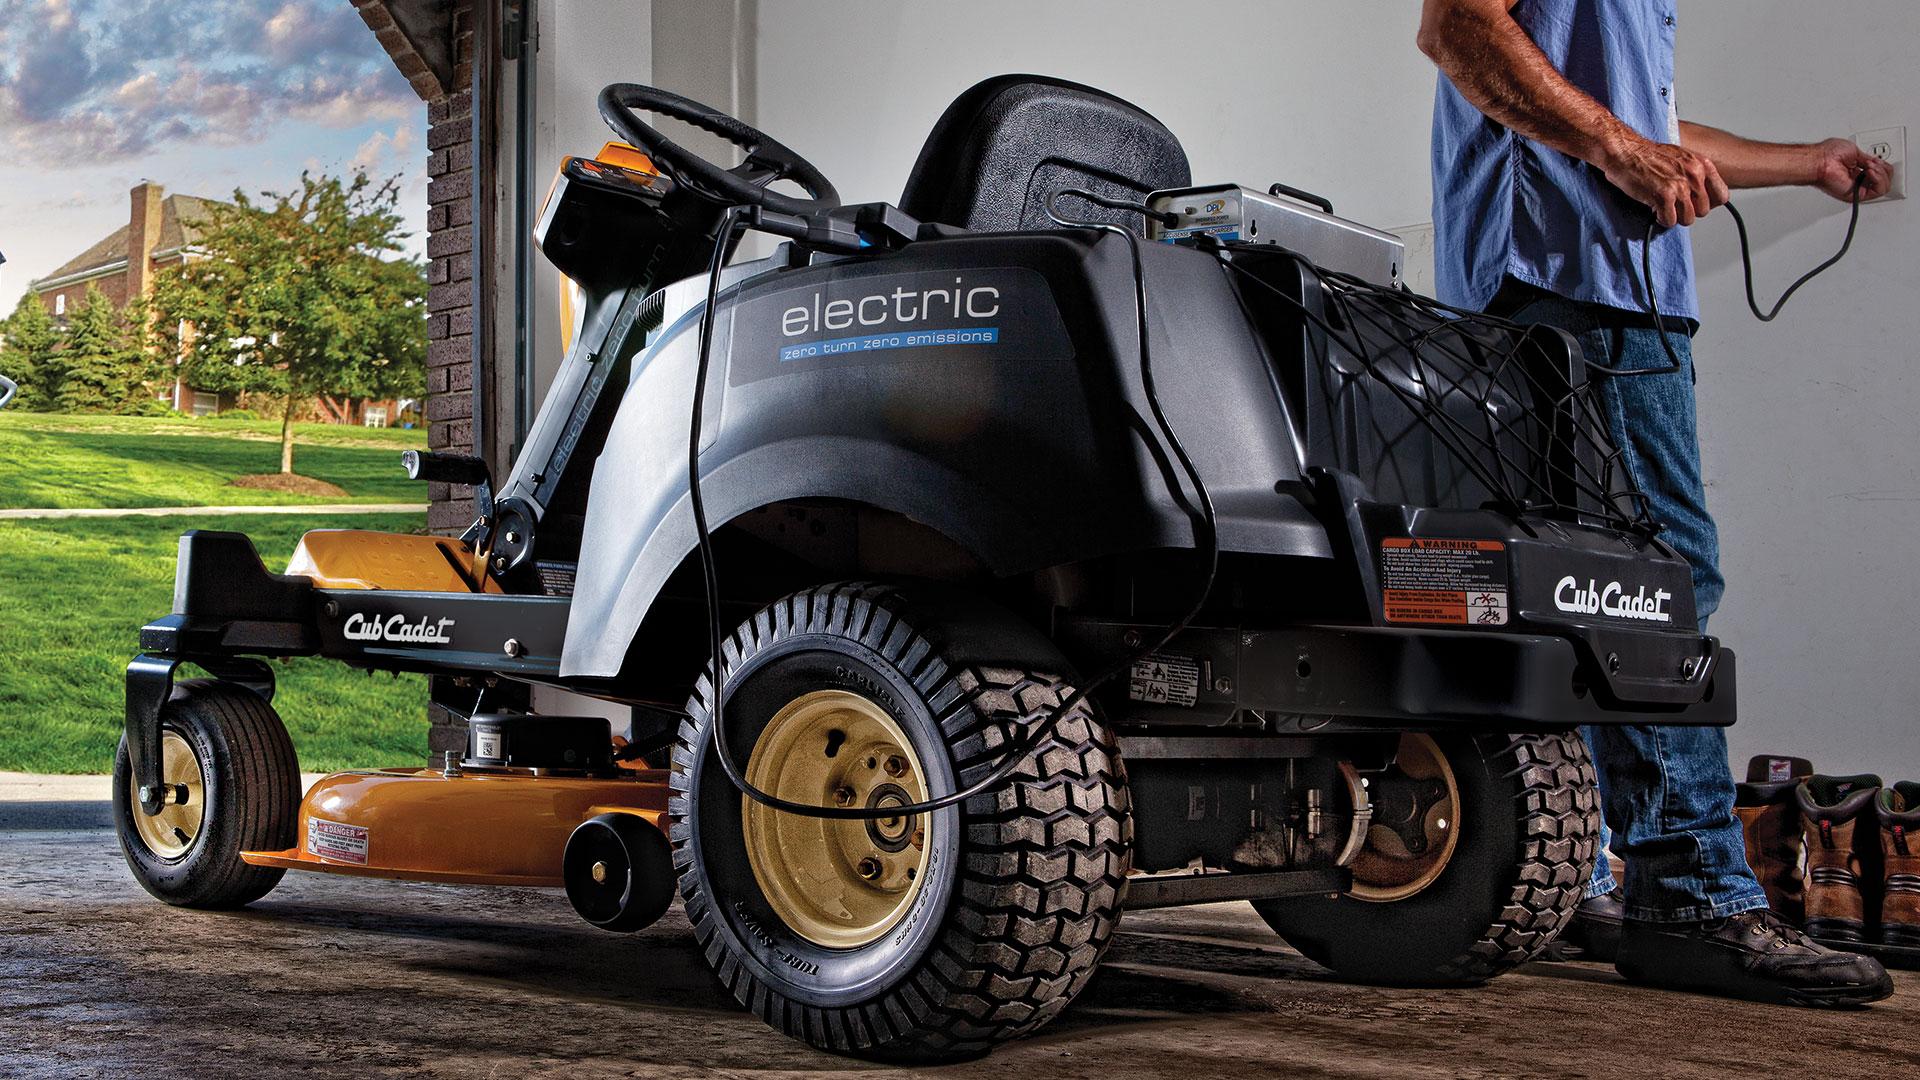 electric riding mower in garage